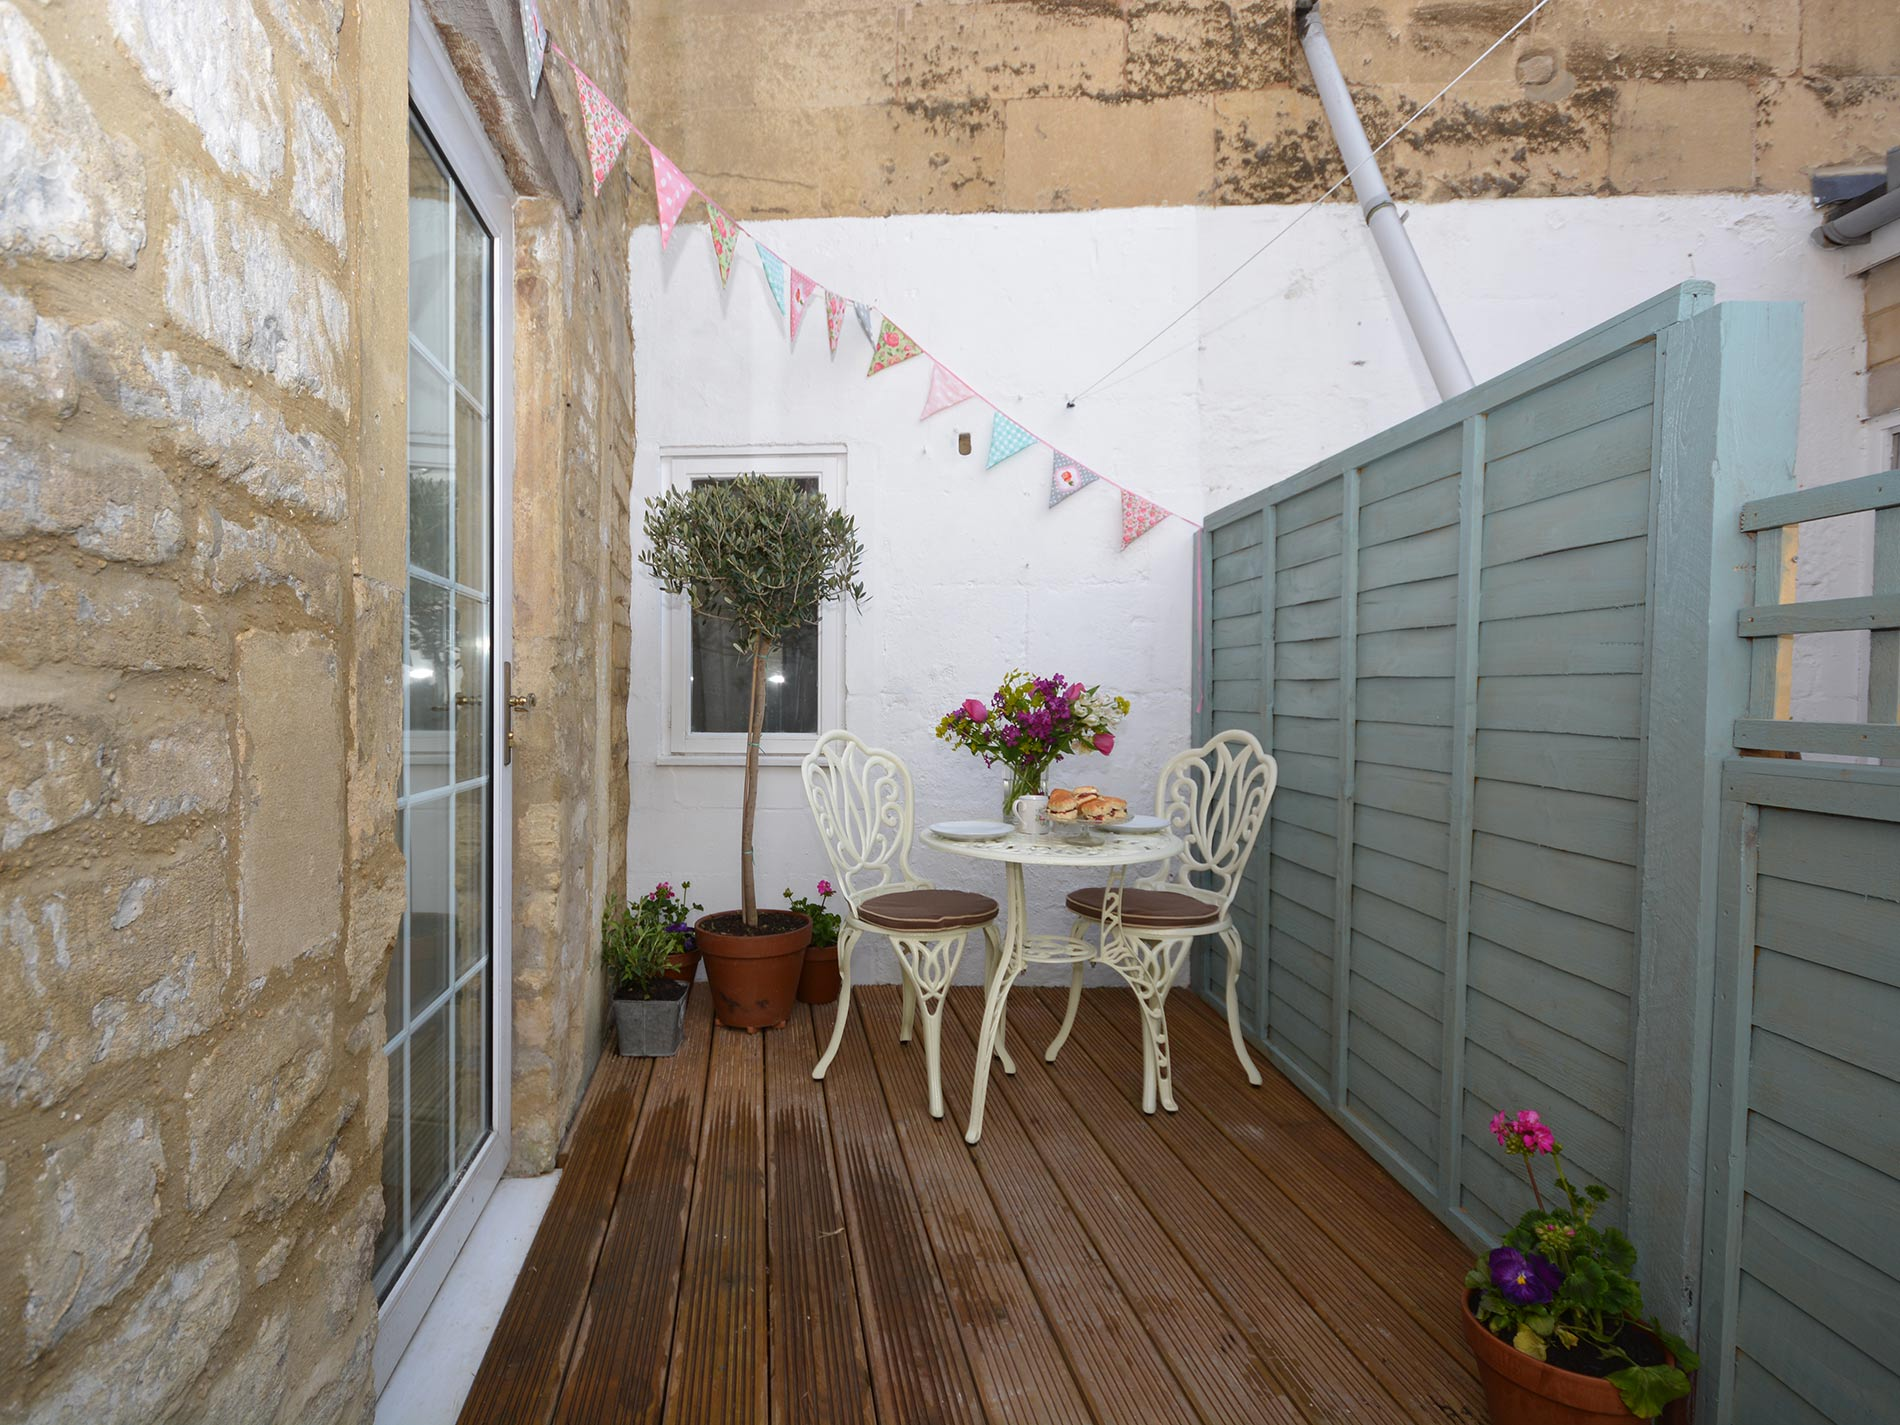 Enclosed decked area